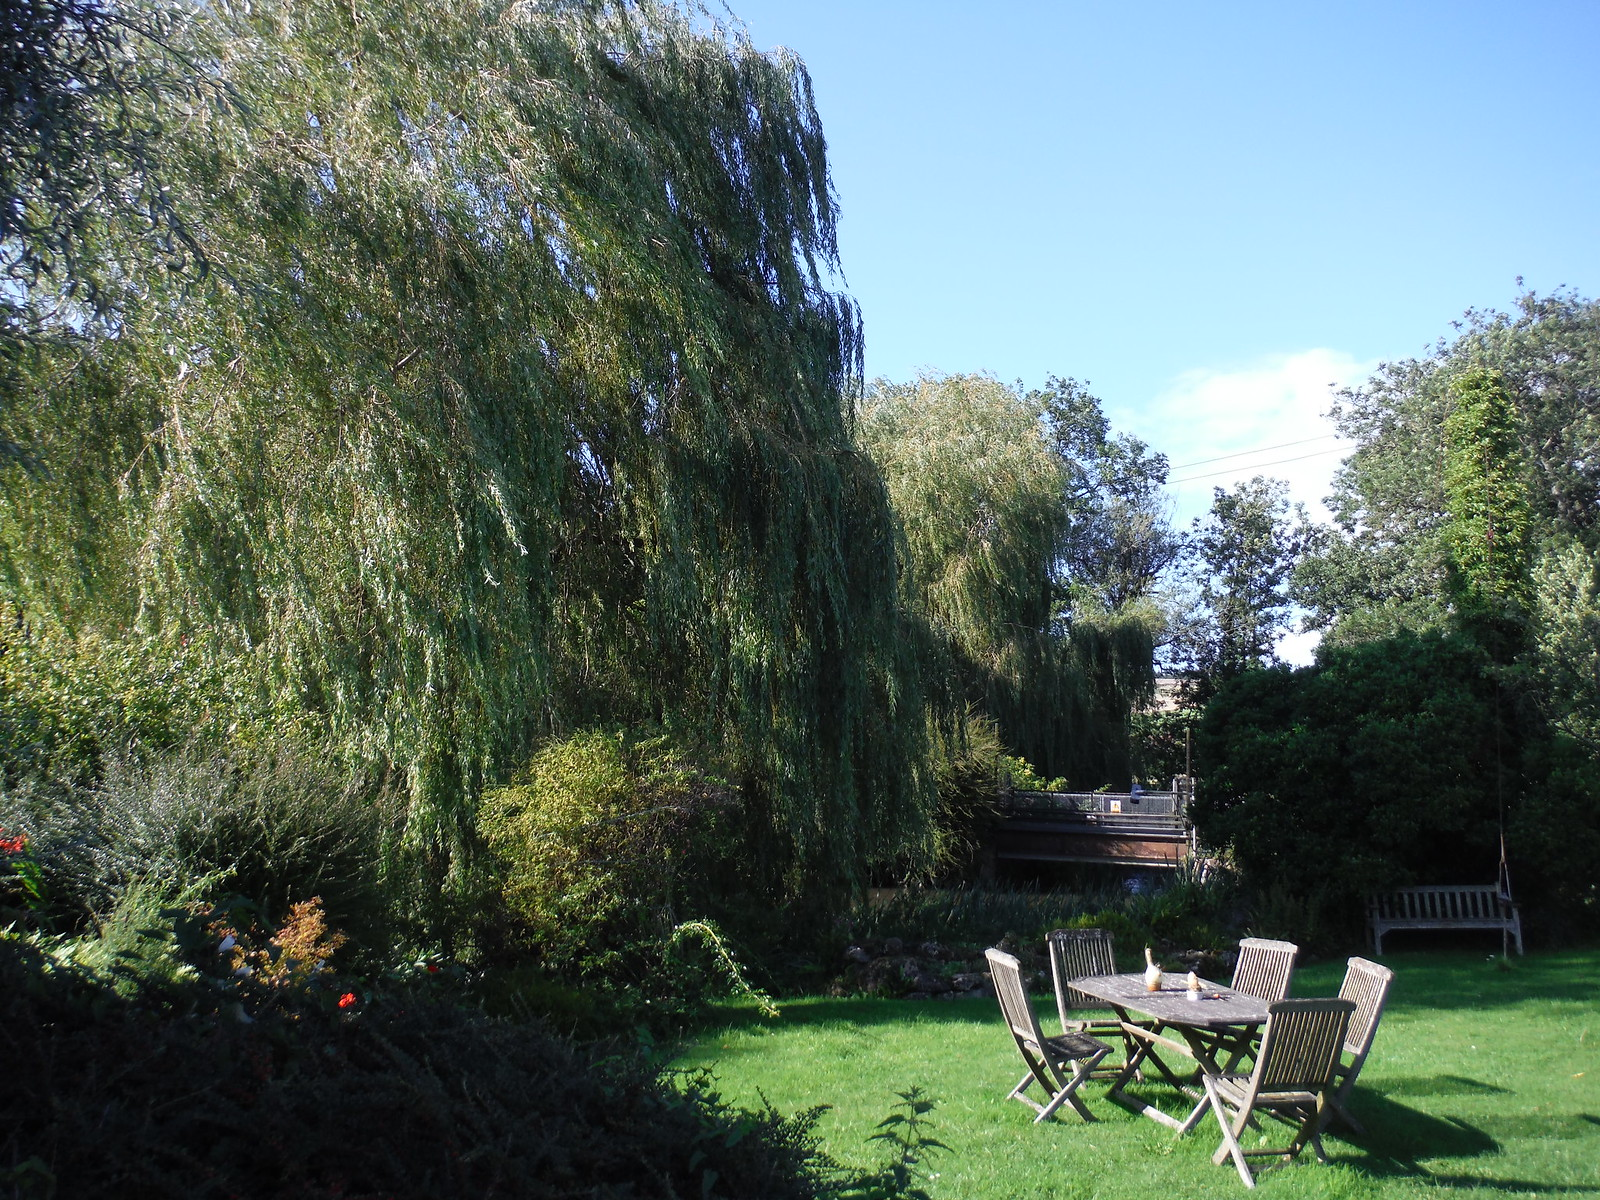 Tisbury Mill Garden SWC Walk 248 Tisbury Circular via Hindon